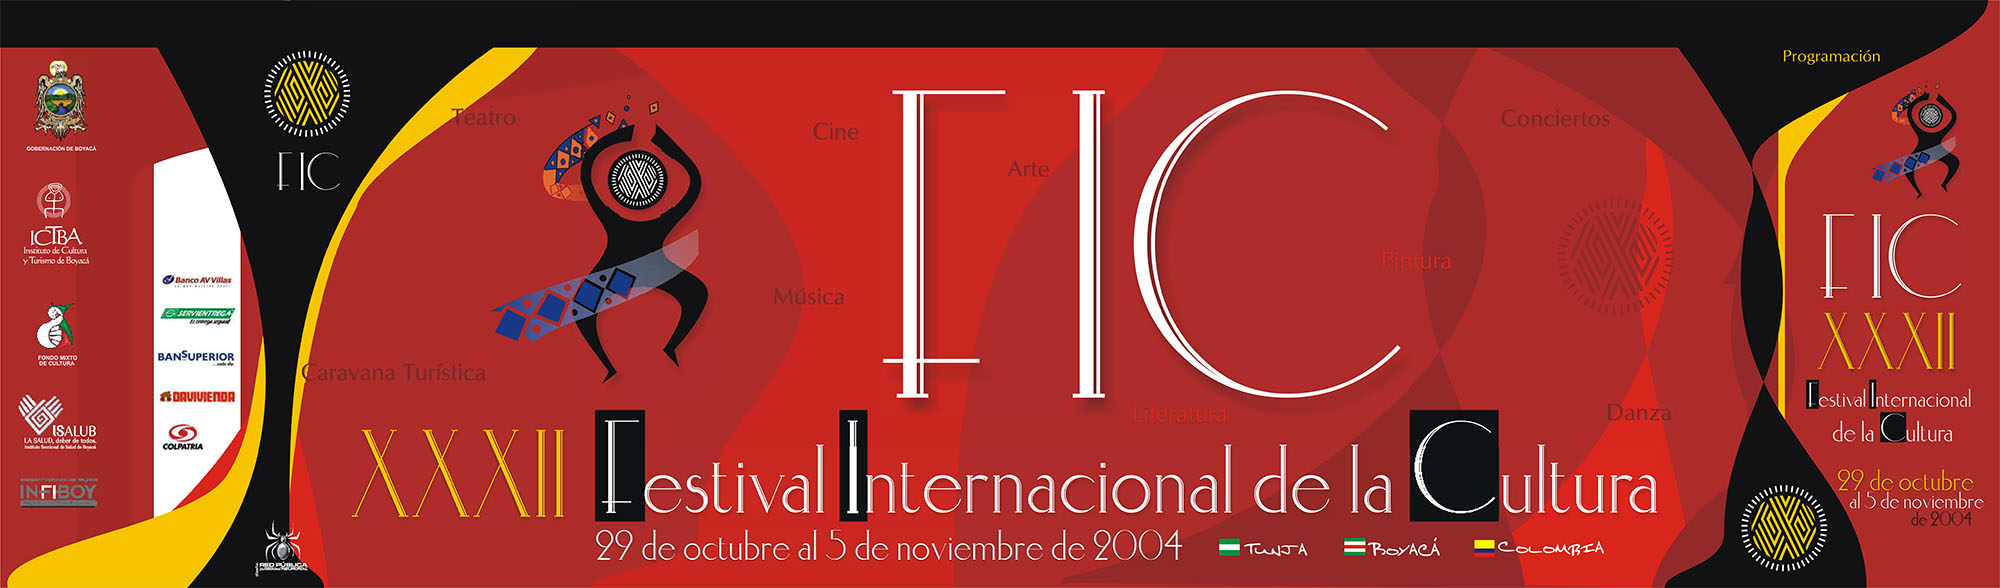 Festival Internacional de Cultura